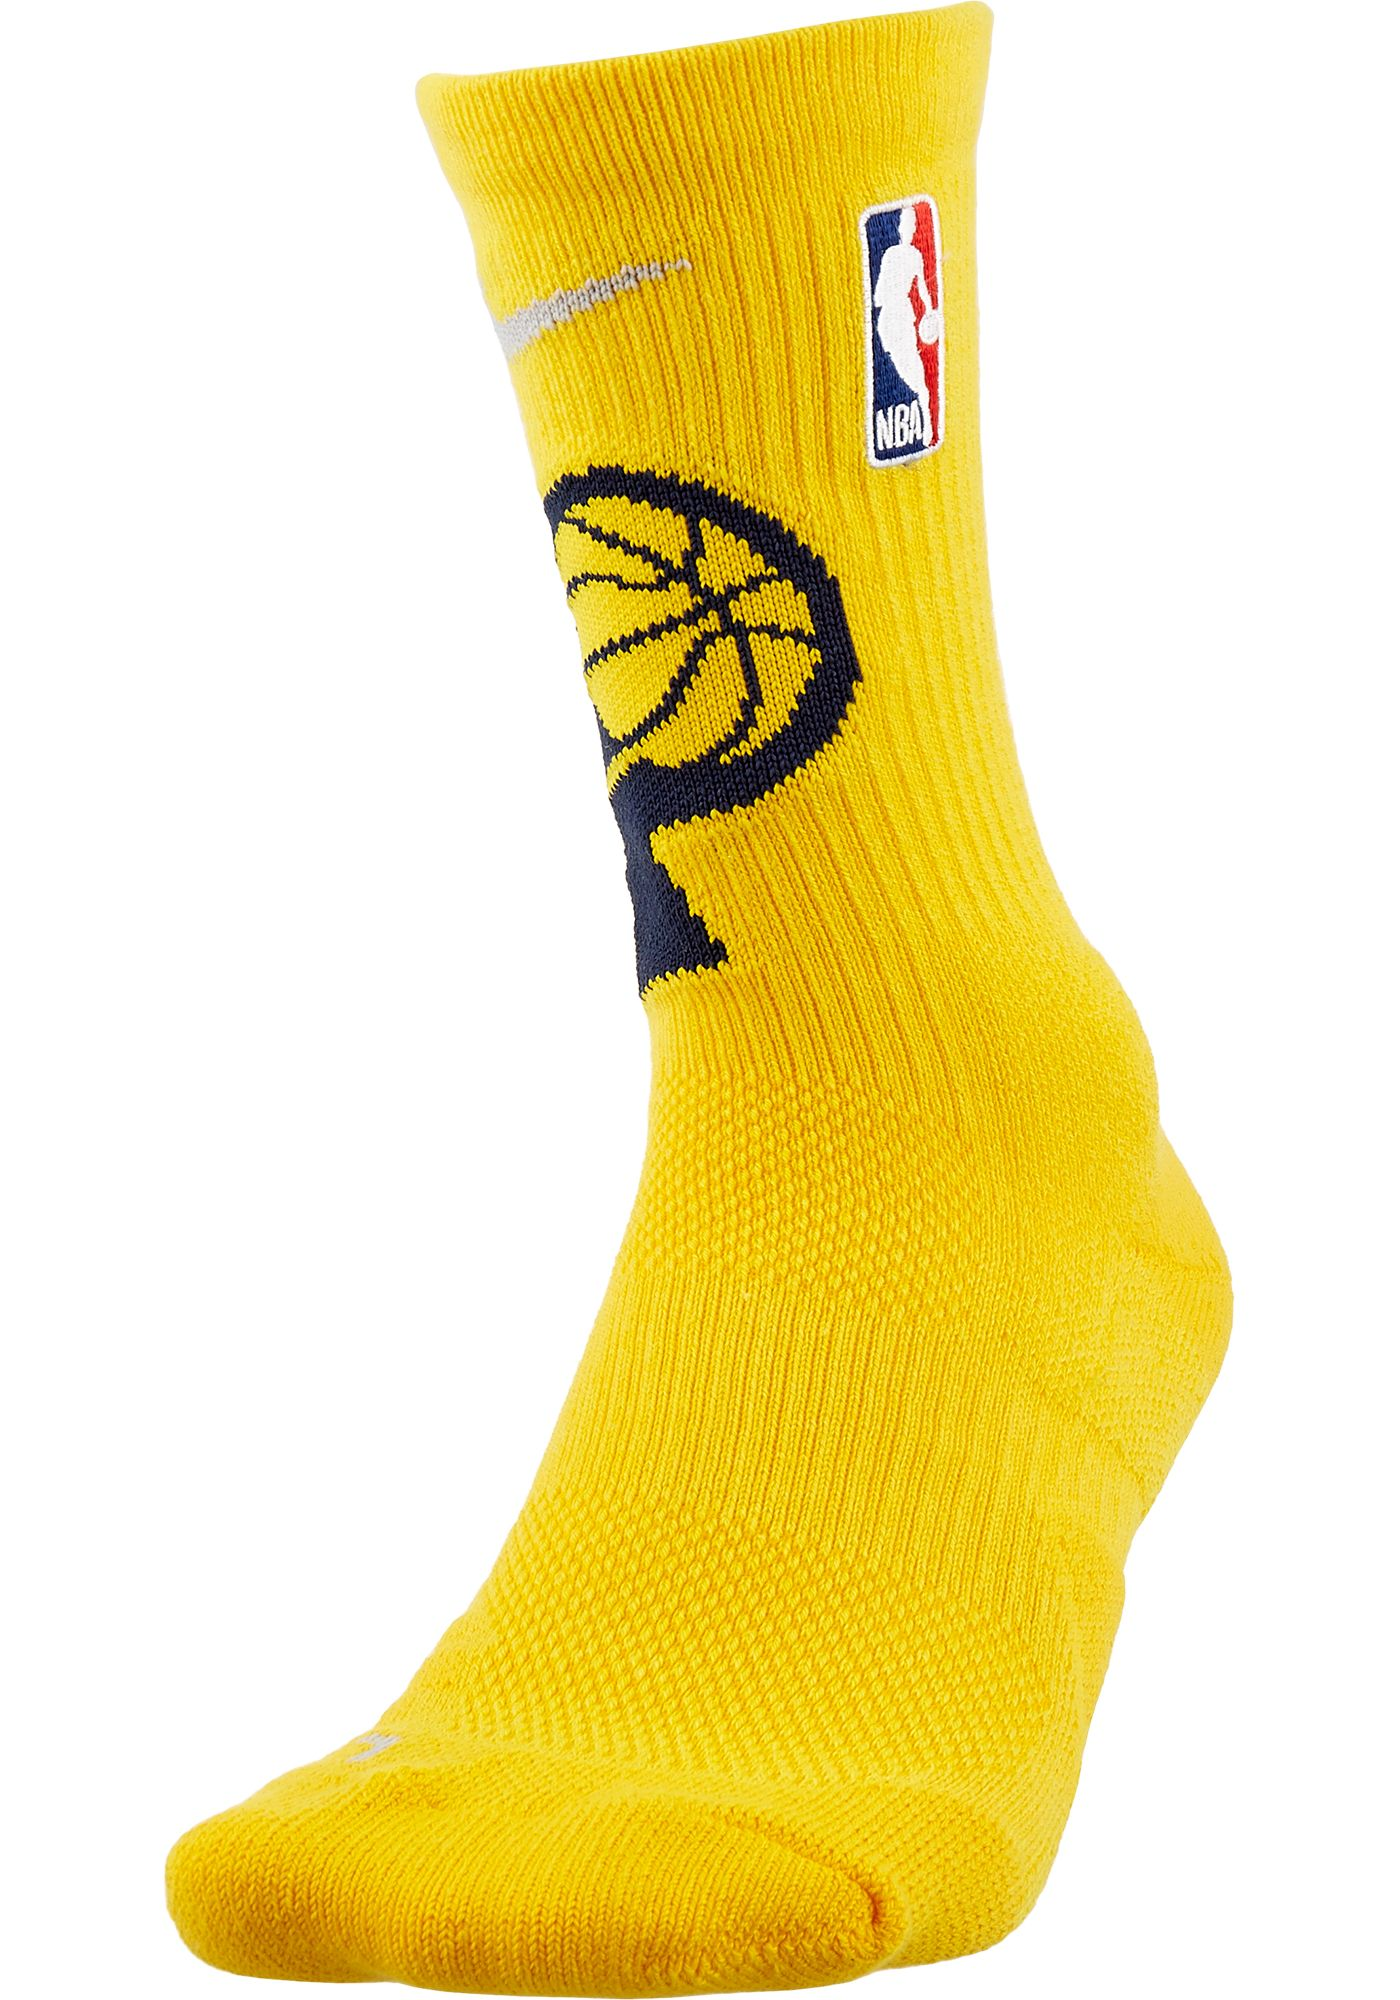 Nike Indiana Pacers Elite Crew Socks